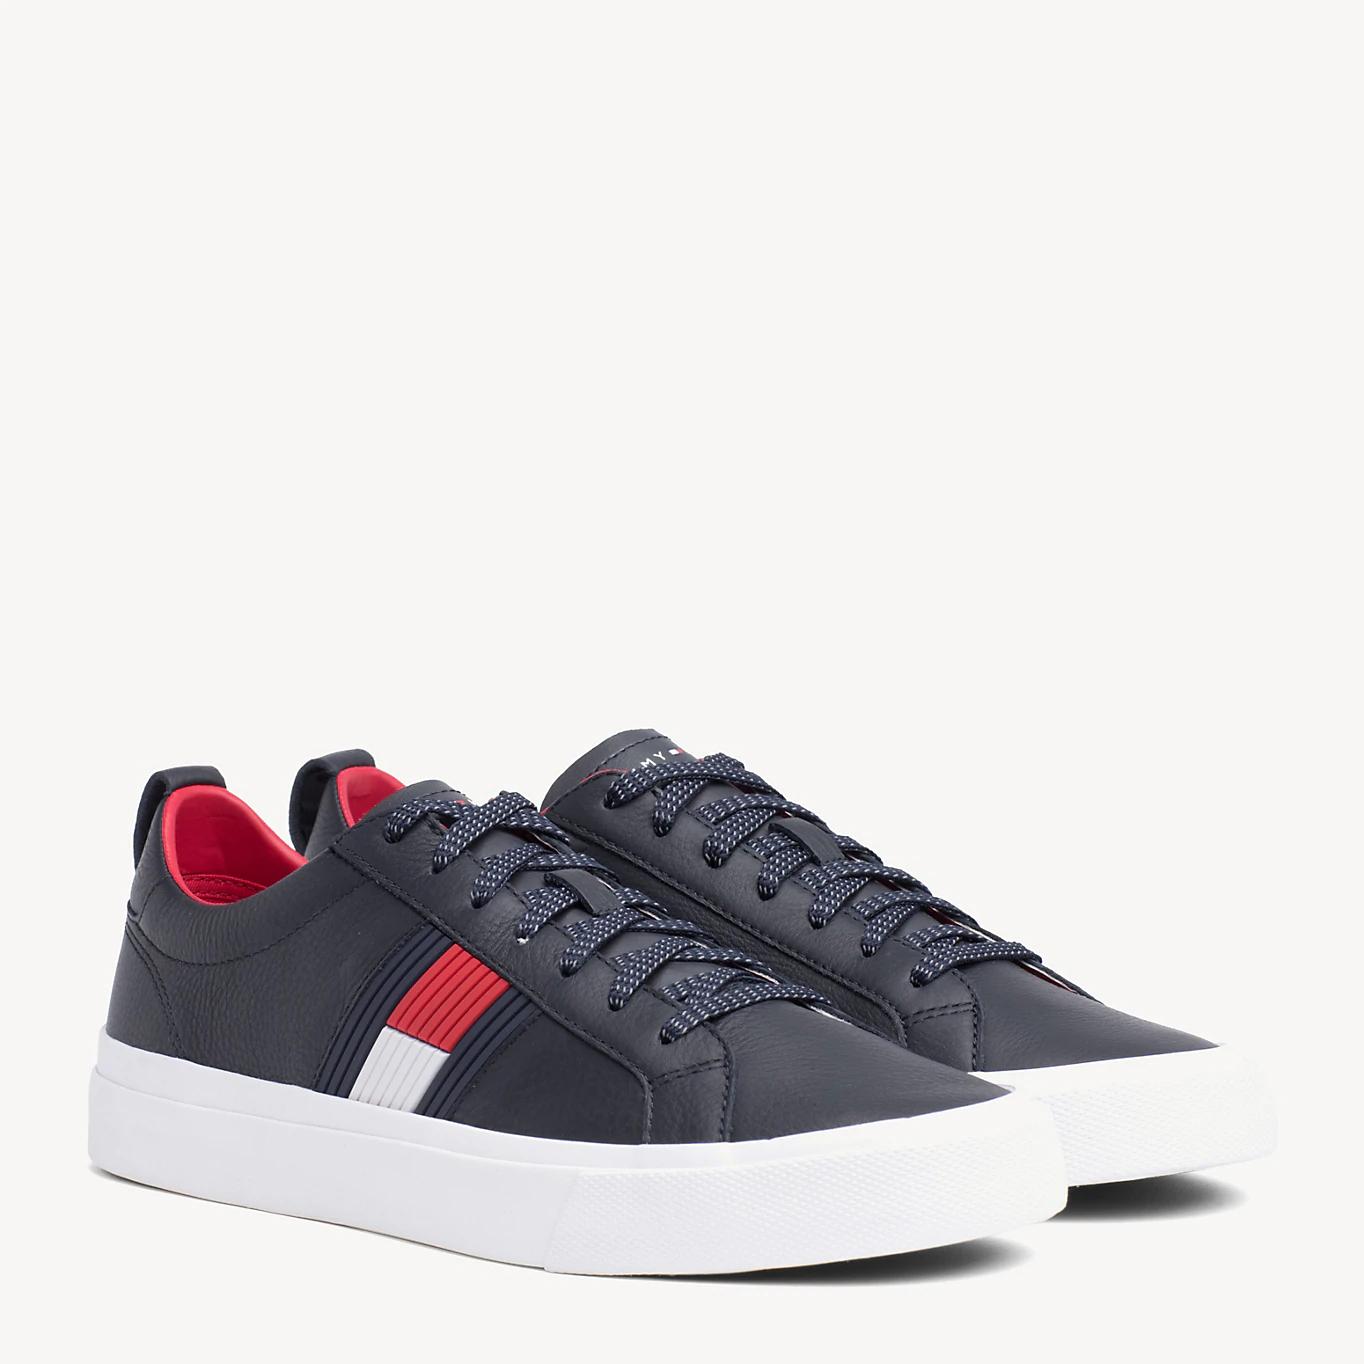 Hilfiger Schuhe im Sale Low-Top aus Leder